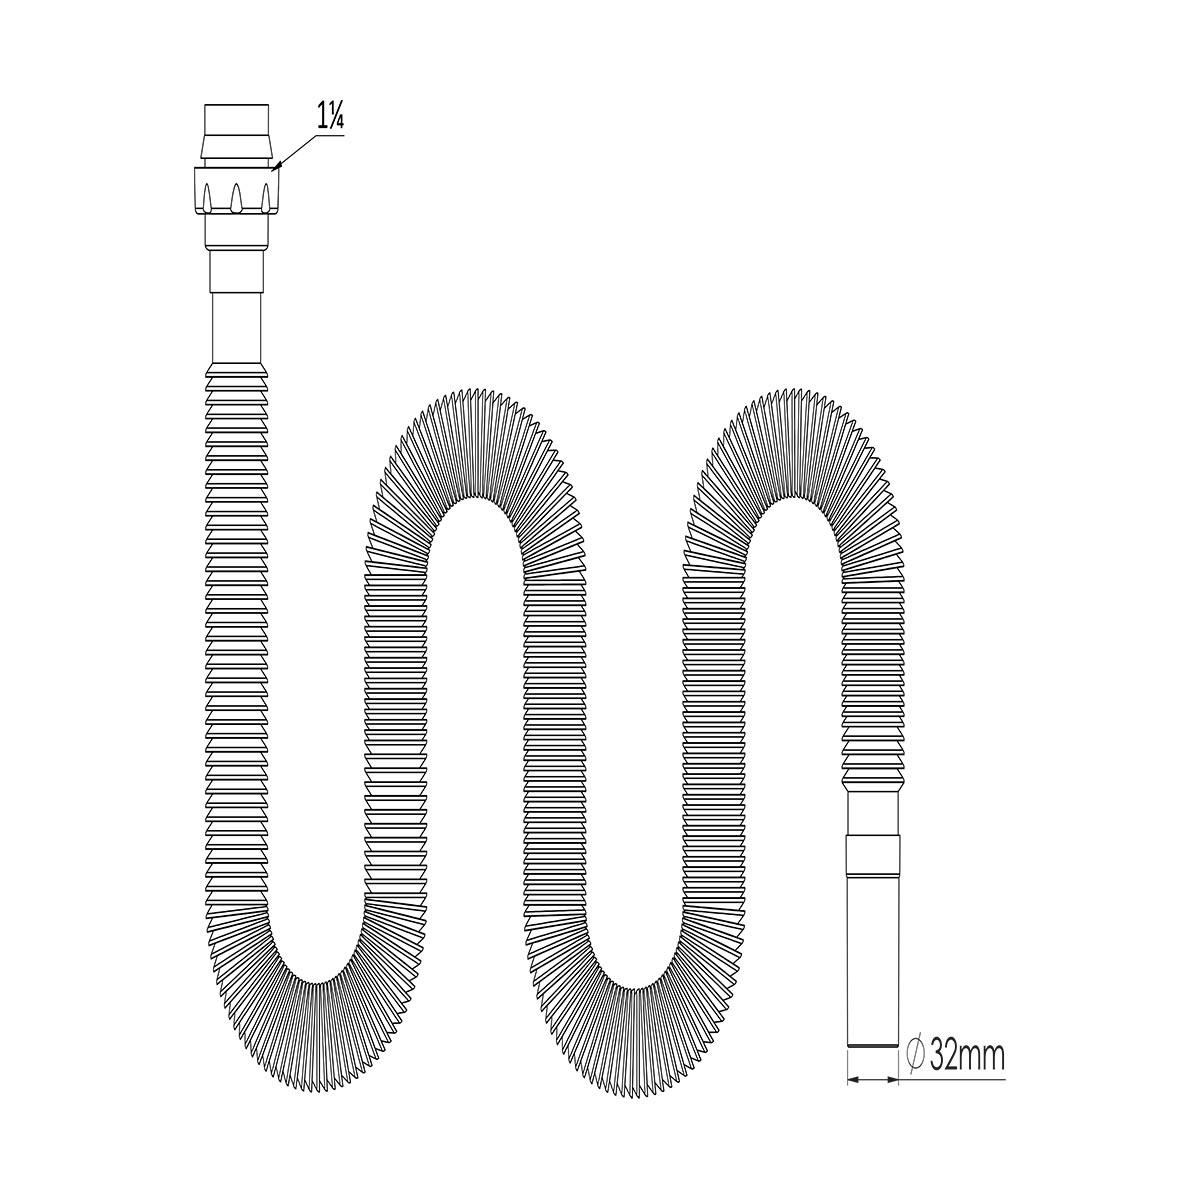 1 ¼ – Ø32 Uzun Körük – Konik Conta